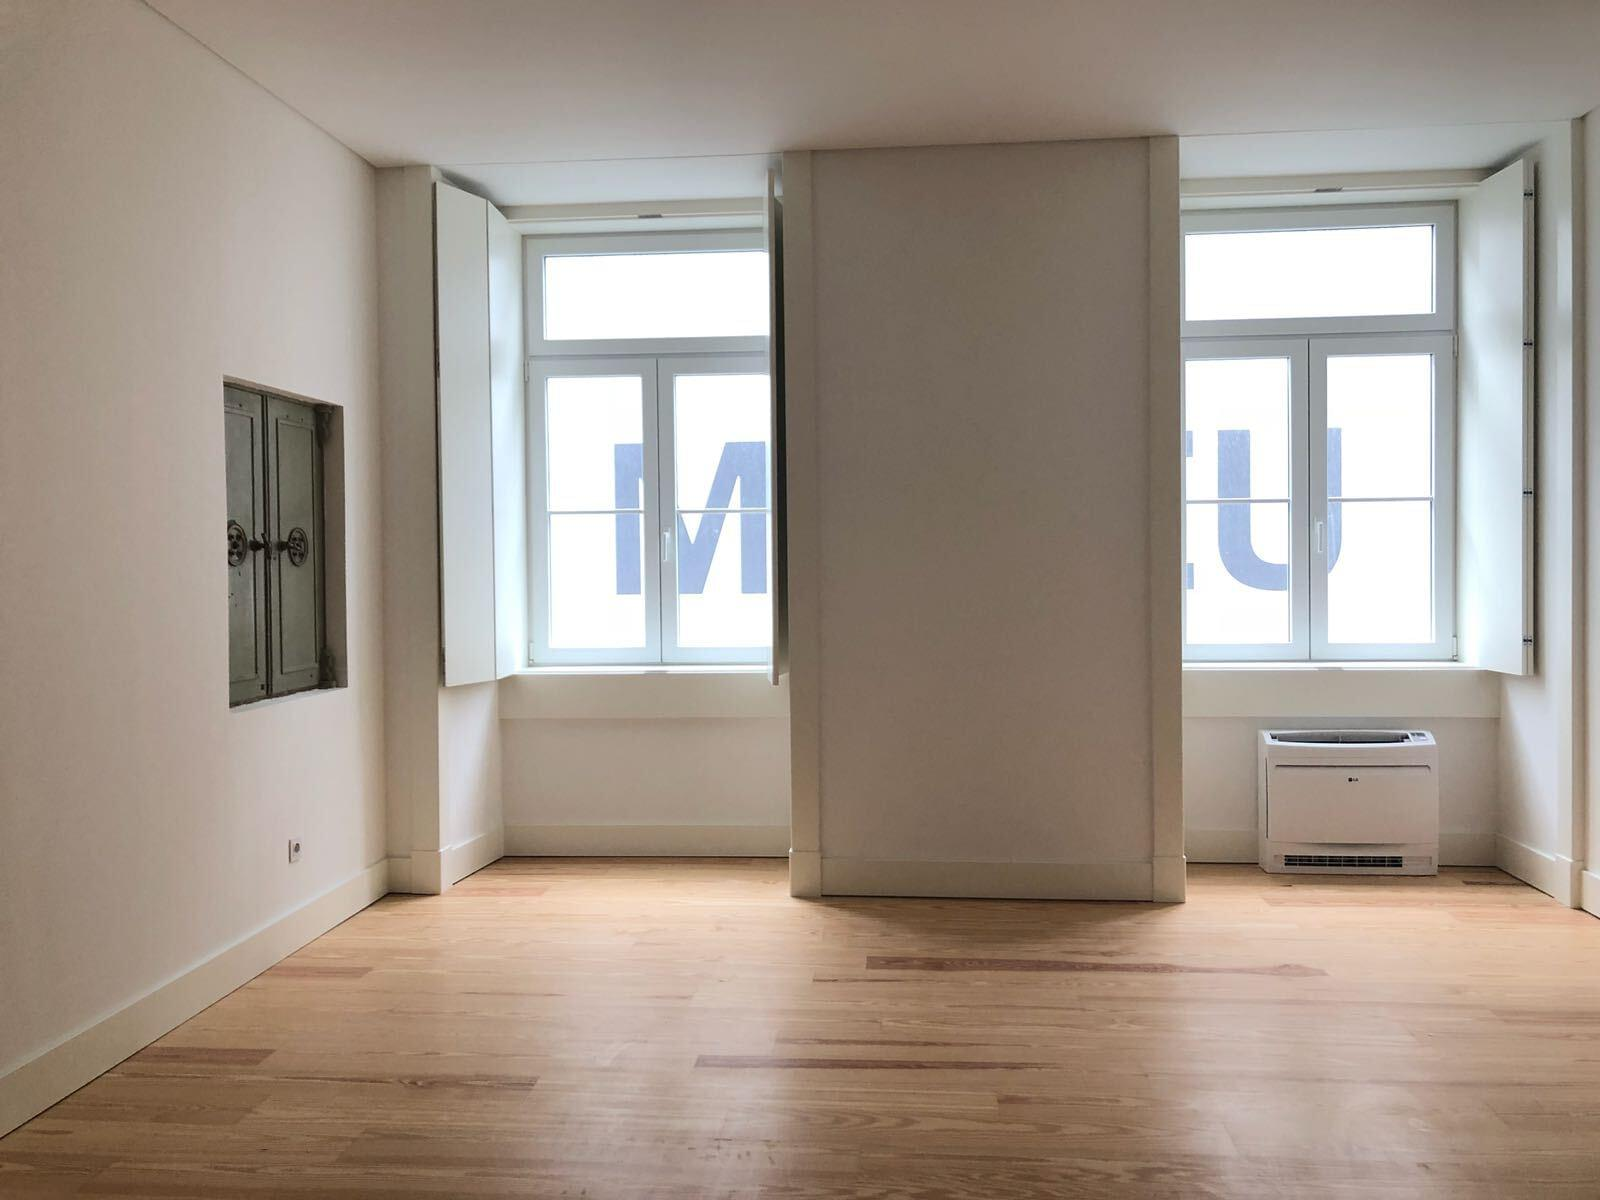 pf17142-apartamento-t2-lisboa-a0d3affa-e28a-4723-b556-55553f95936c